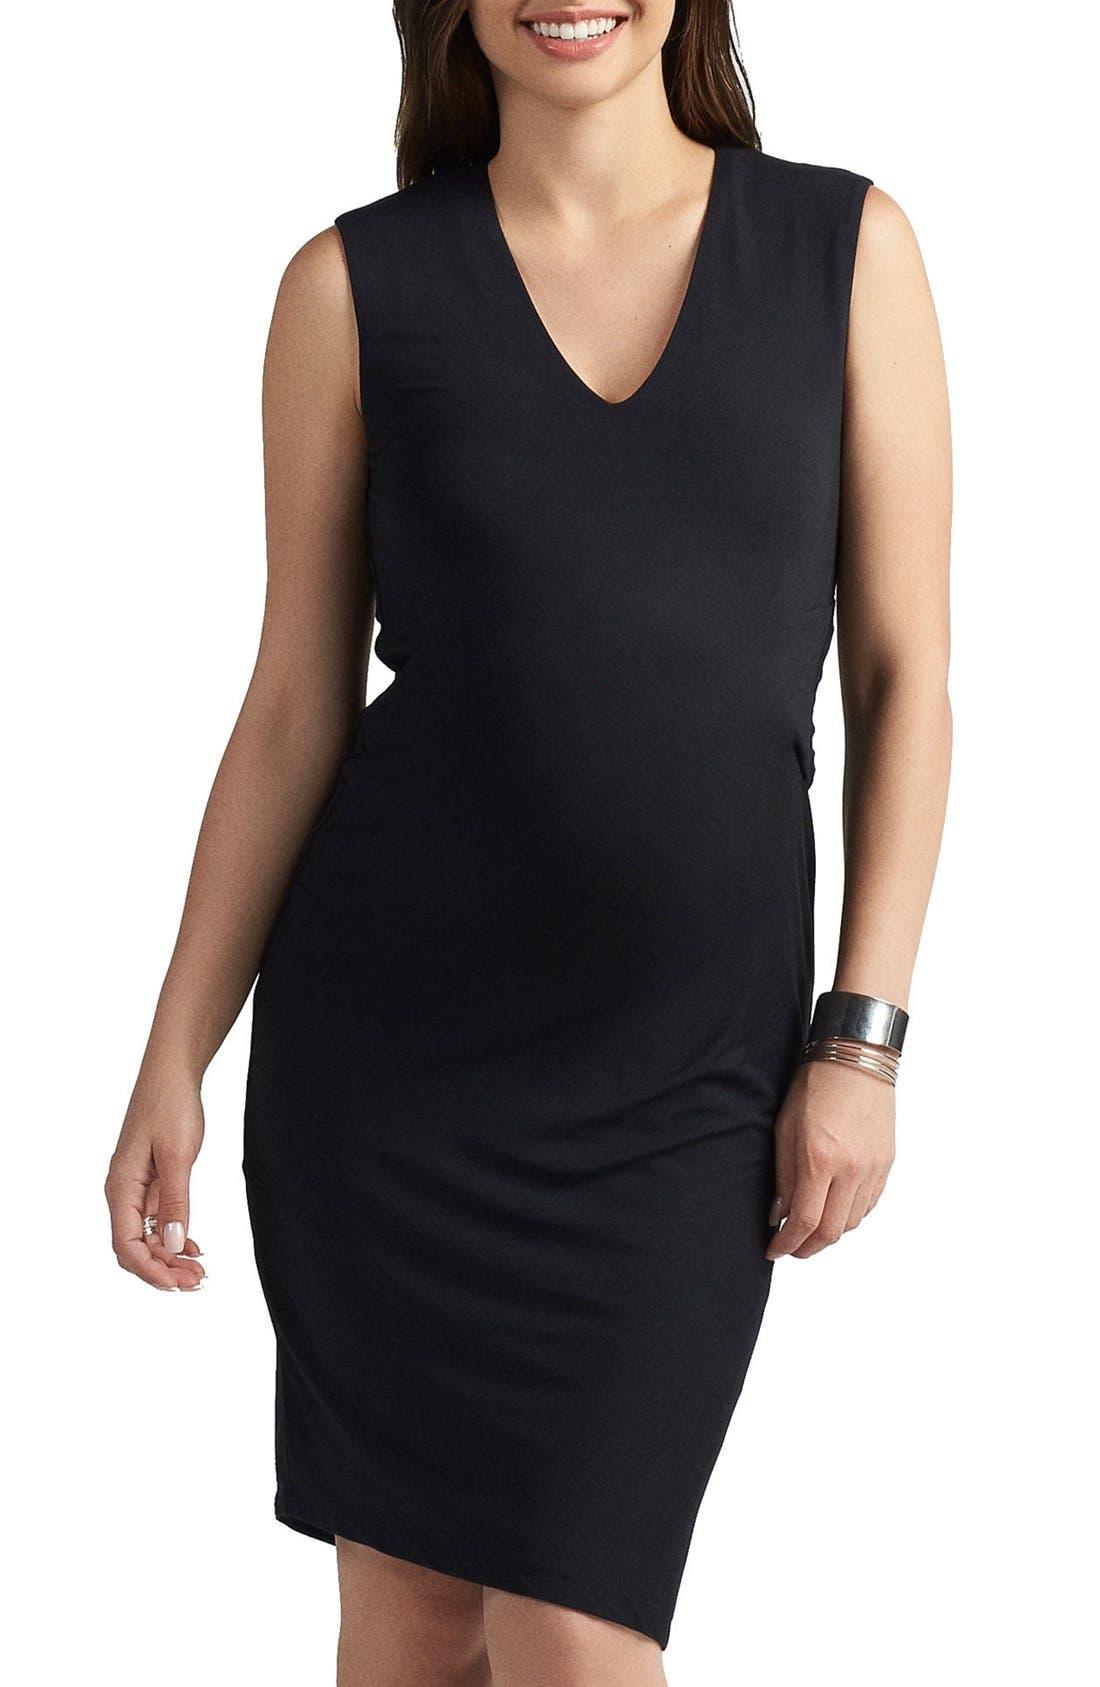 Margaux Maternity Dress,                             Main thumbnail 1, color,                             BLACK